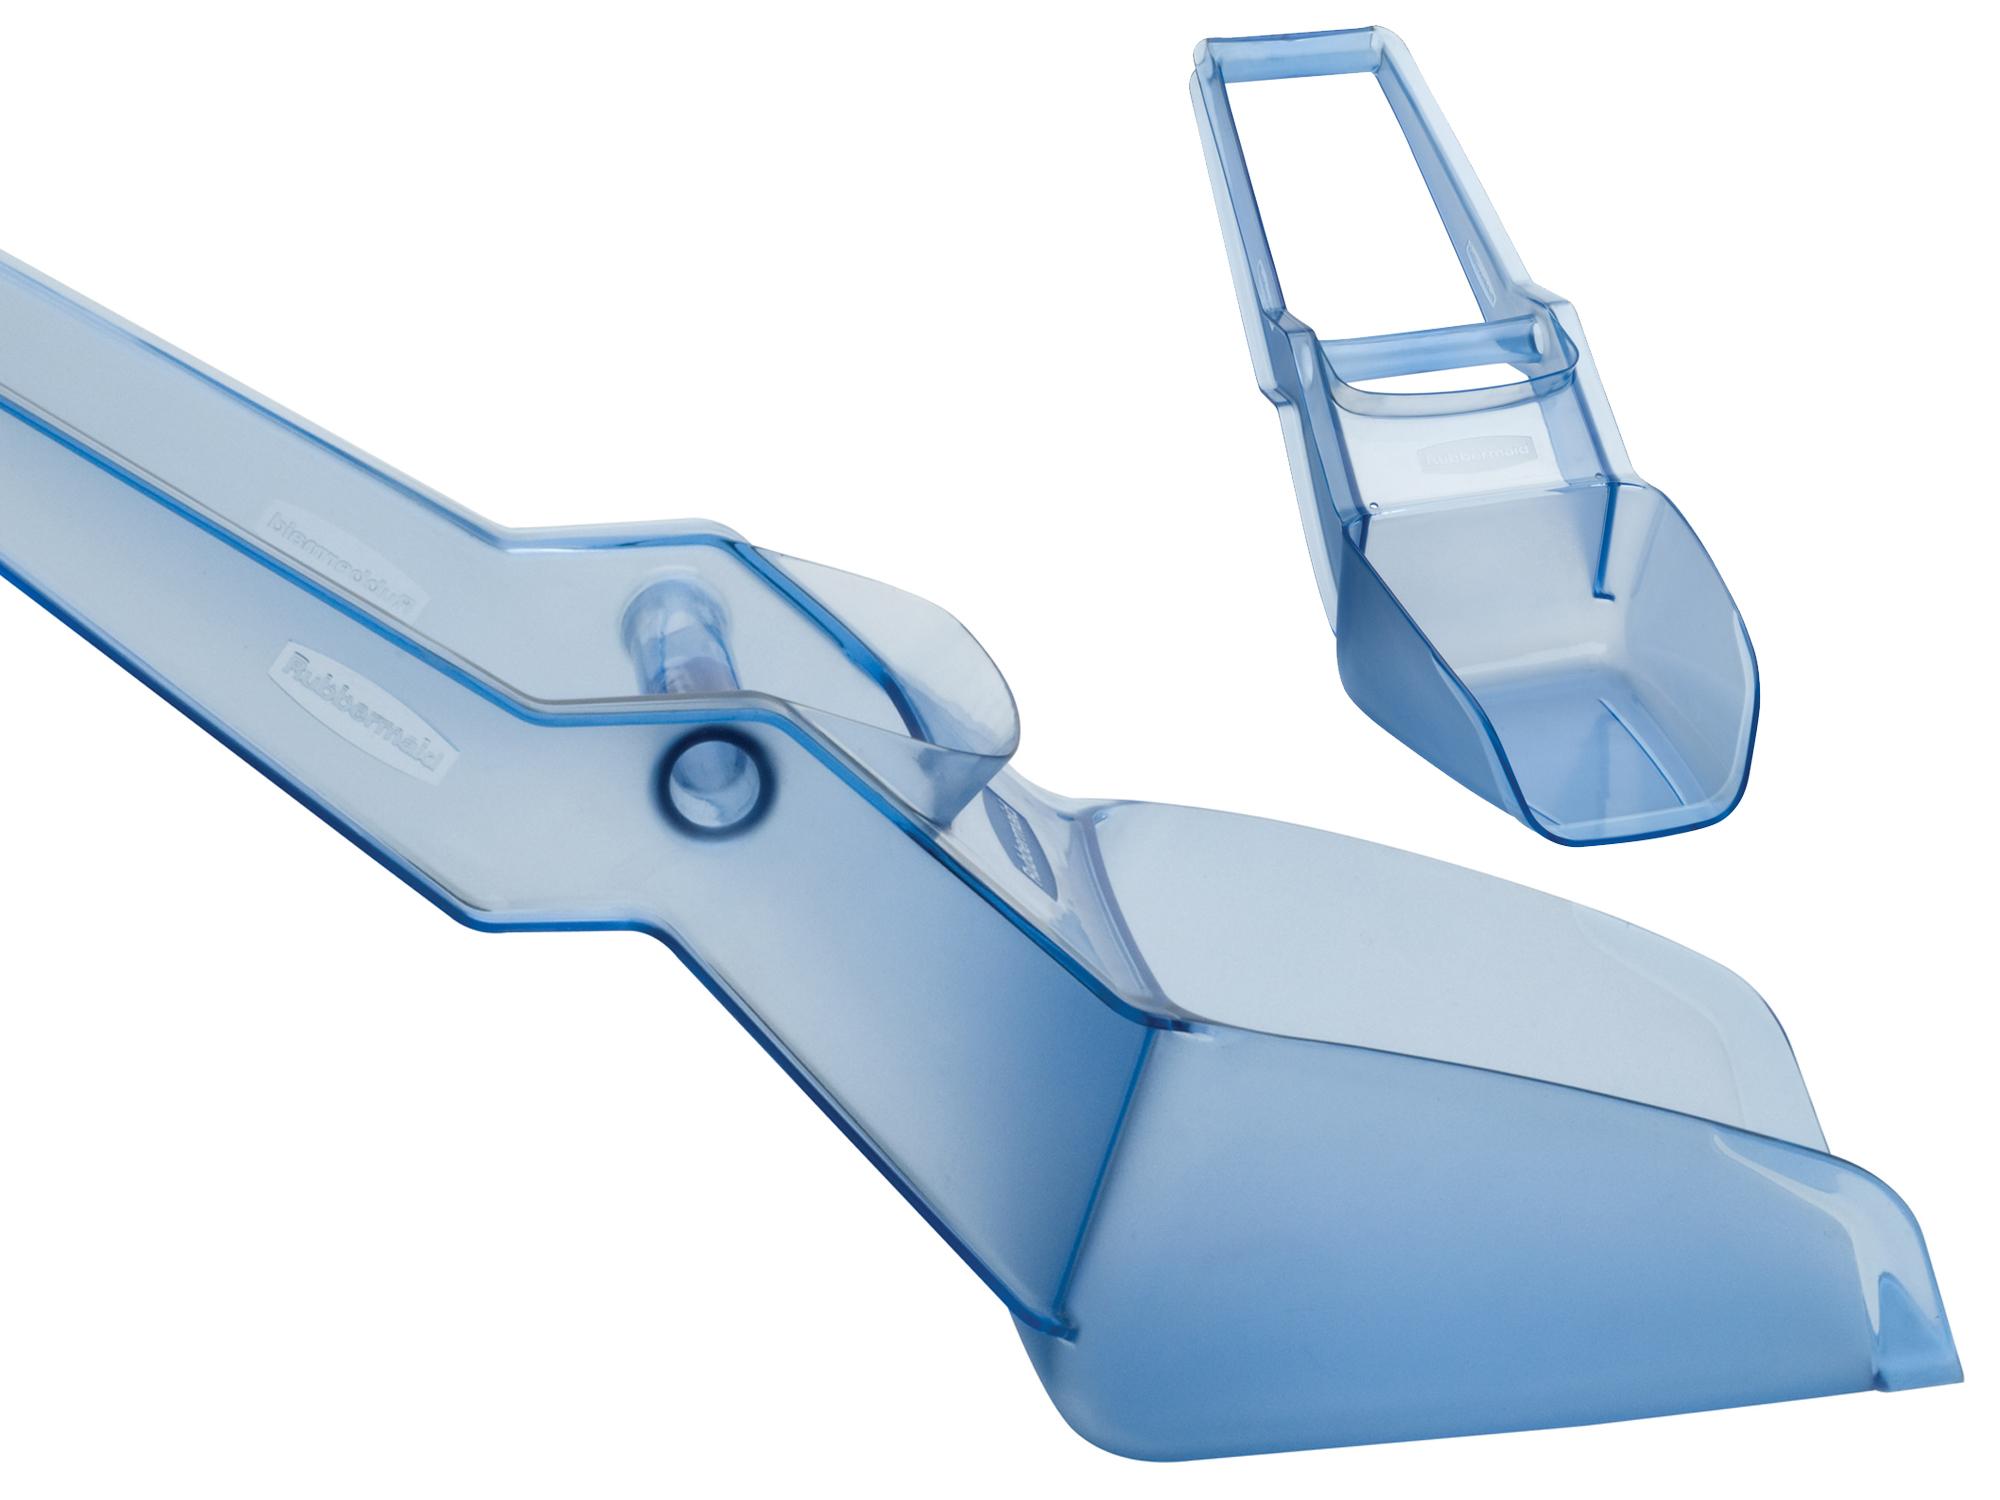 RUBBERMAID     Scovel Ice Scoop